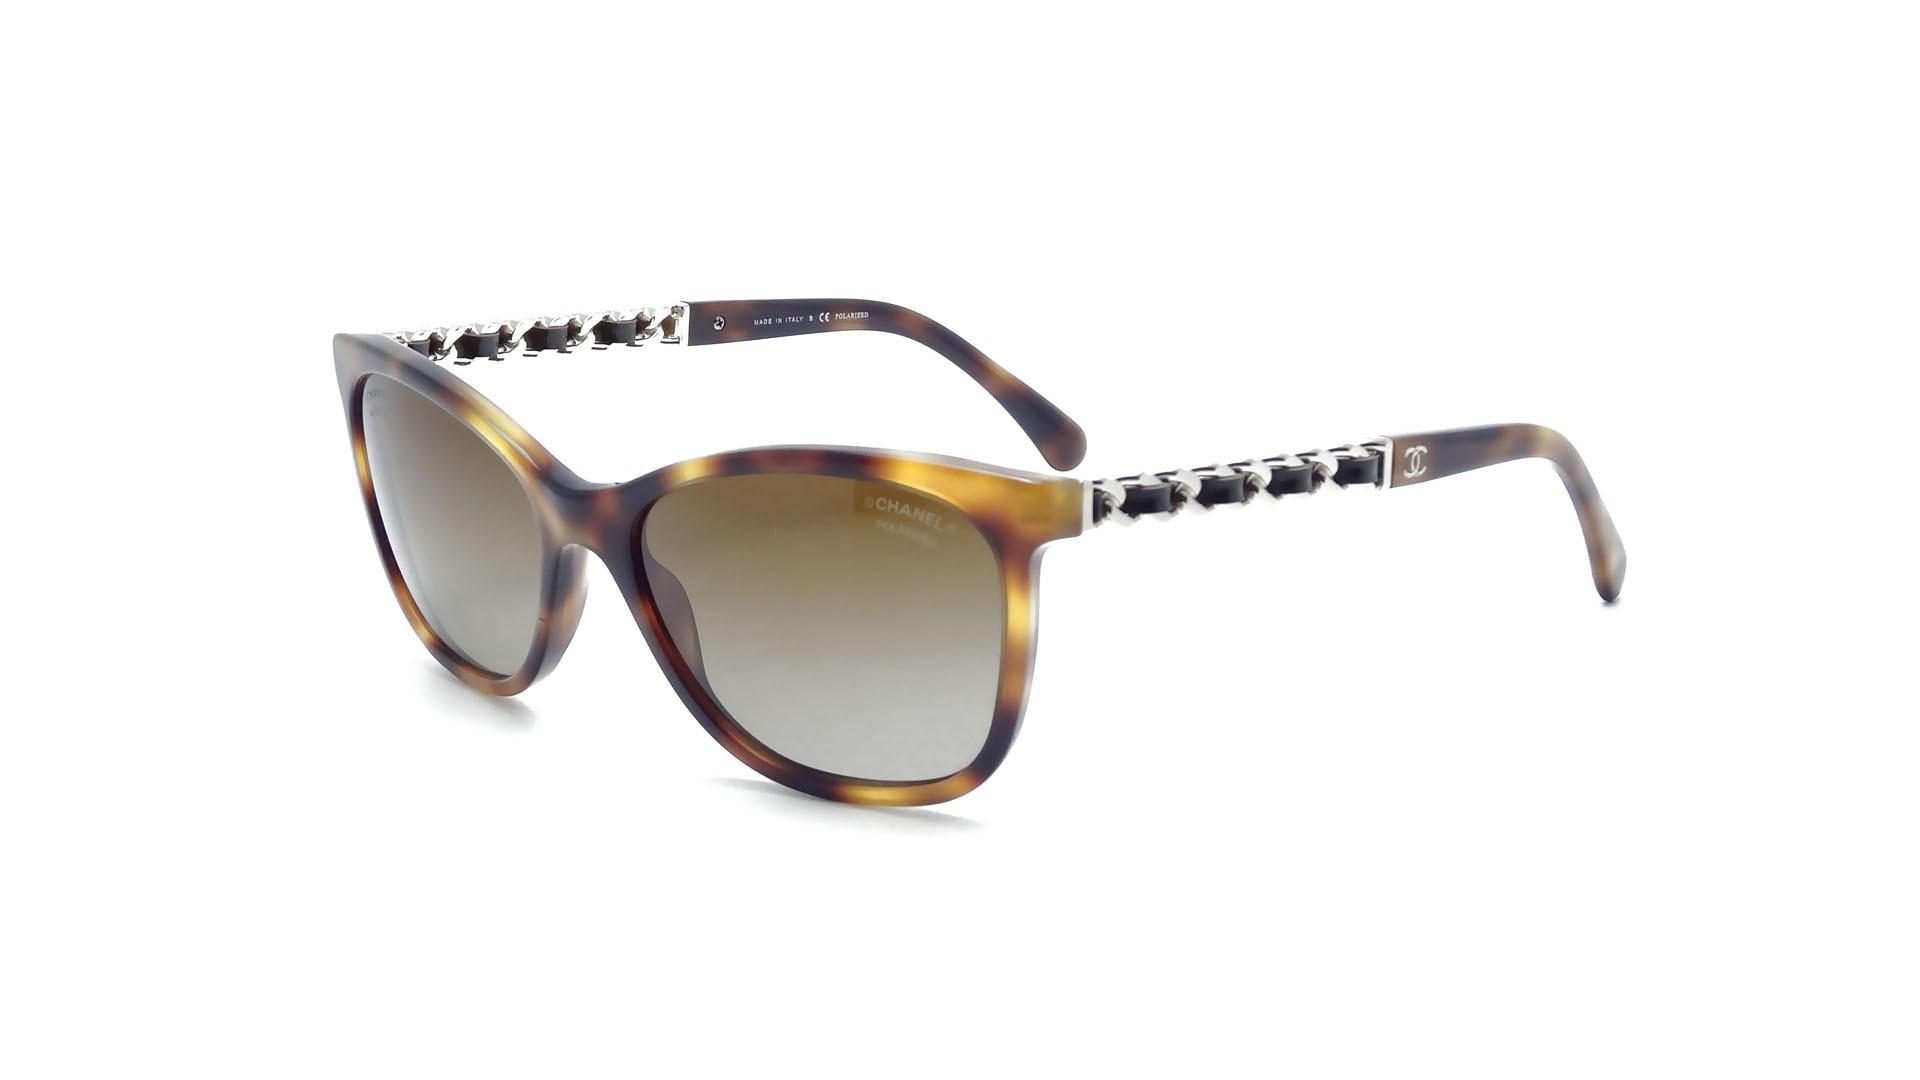 a5622b5921 Chanel Polarized Sunglasses Price